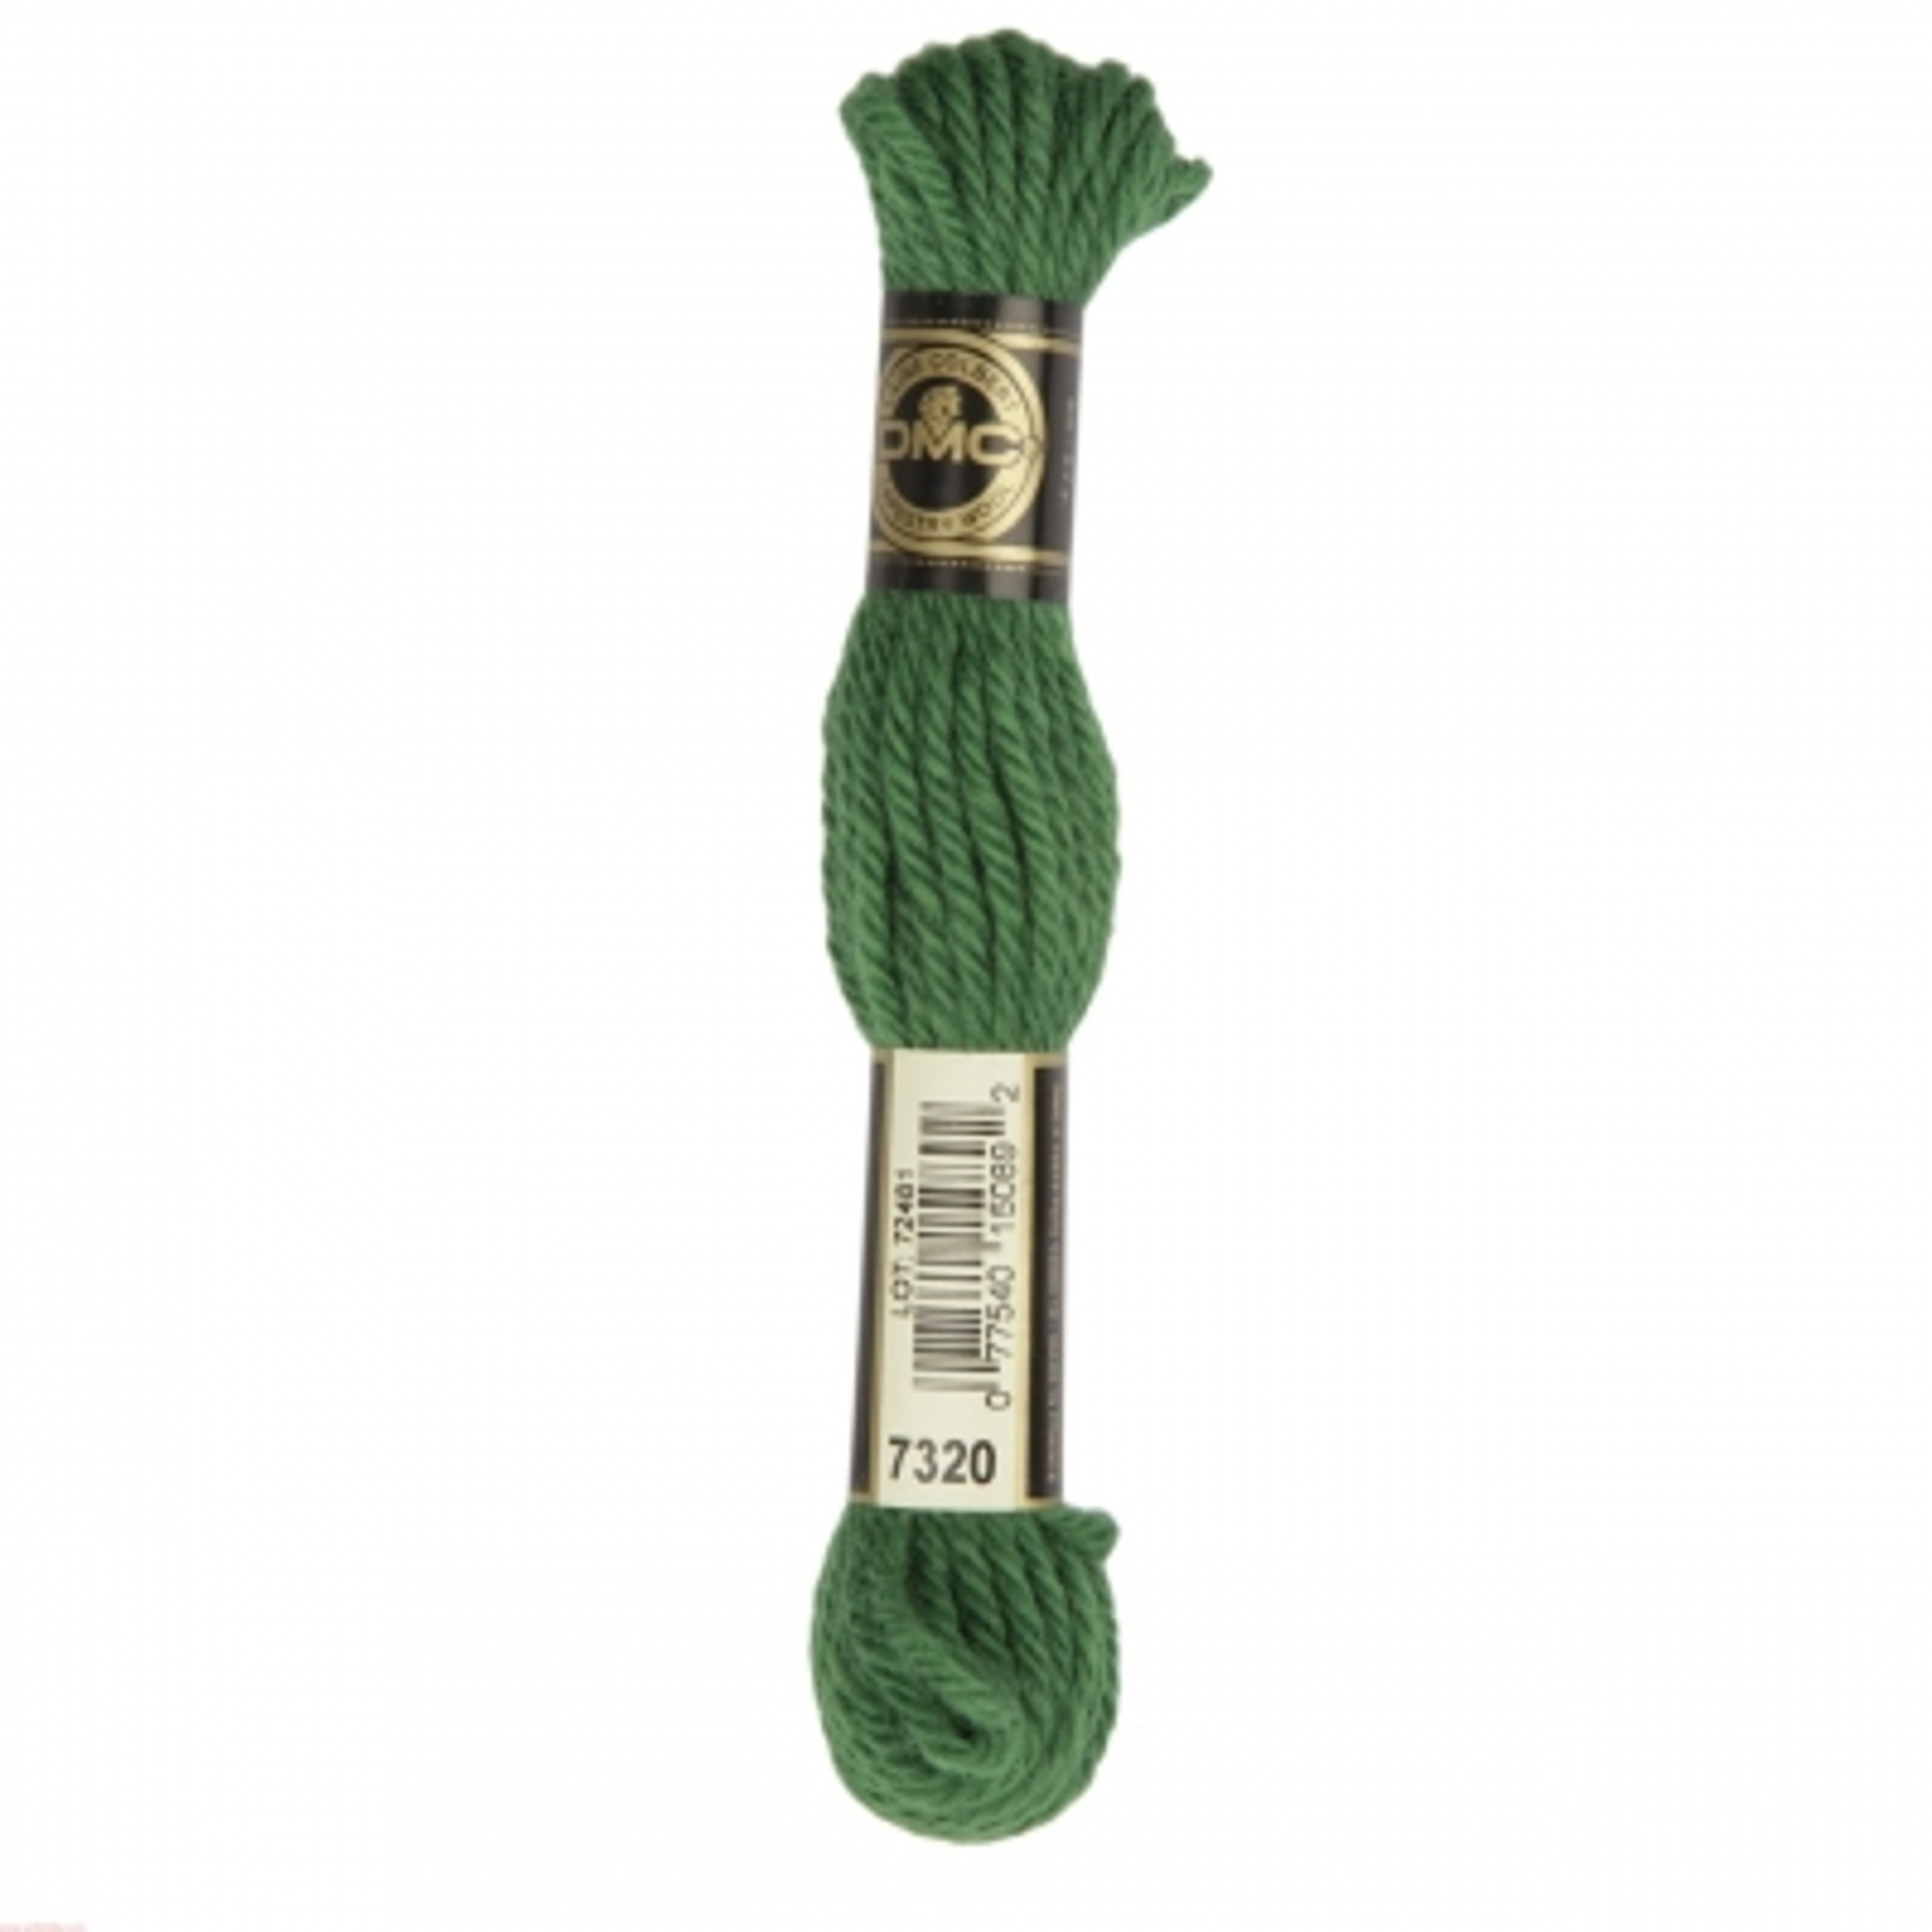 DMC 4 Ply Tapestry Wool per pack of 2